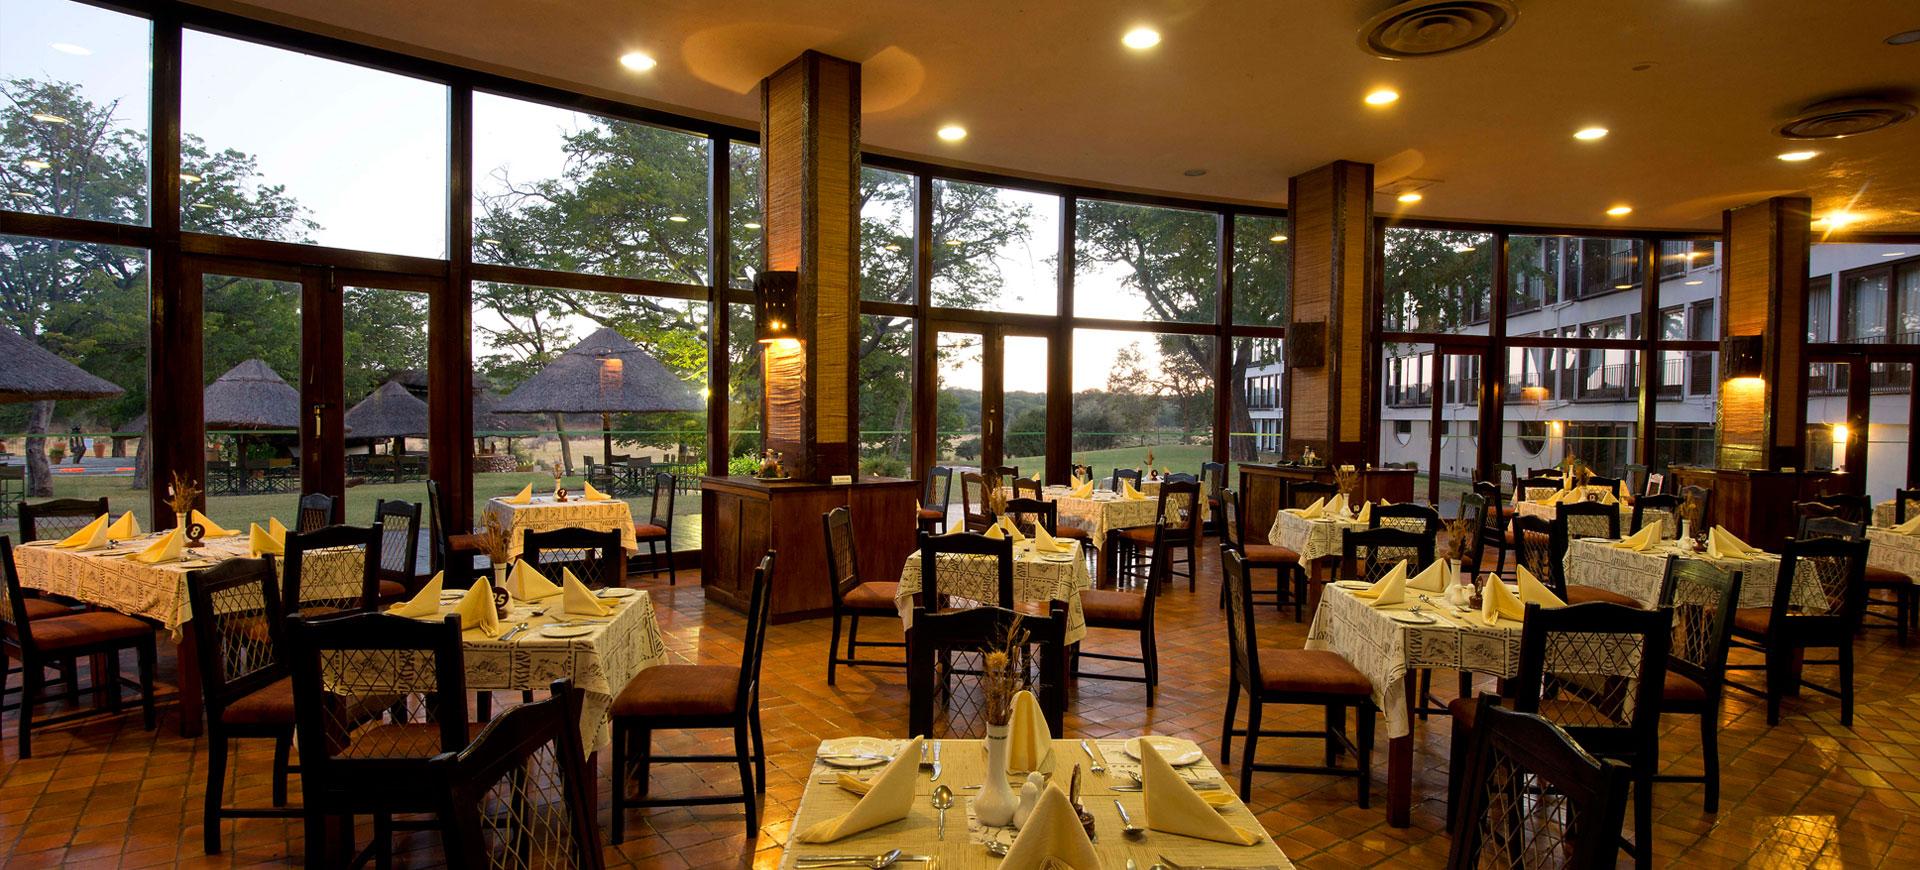 Hwange Safari Lodge Conference Venue